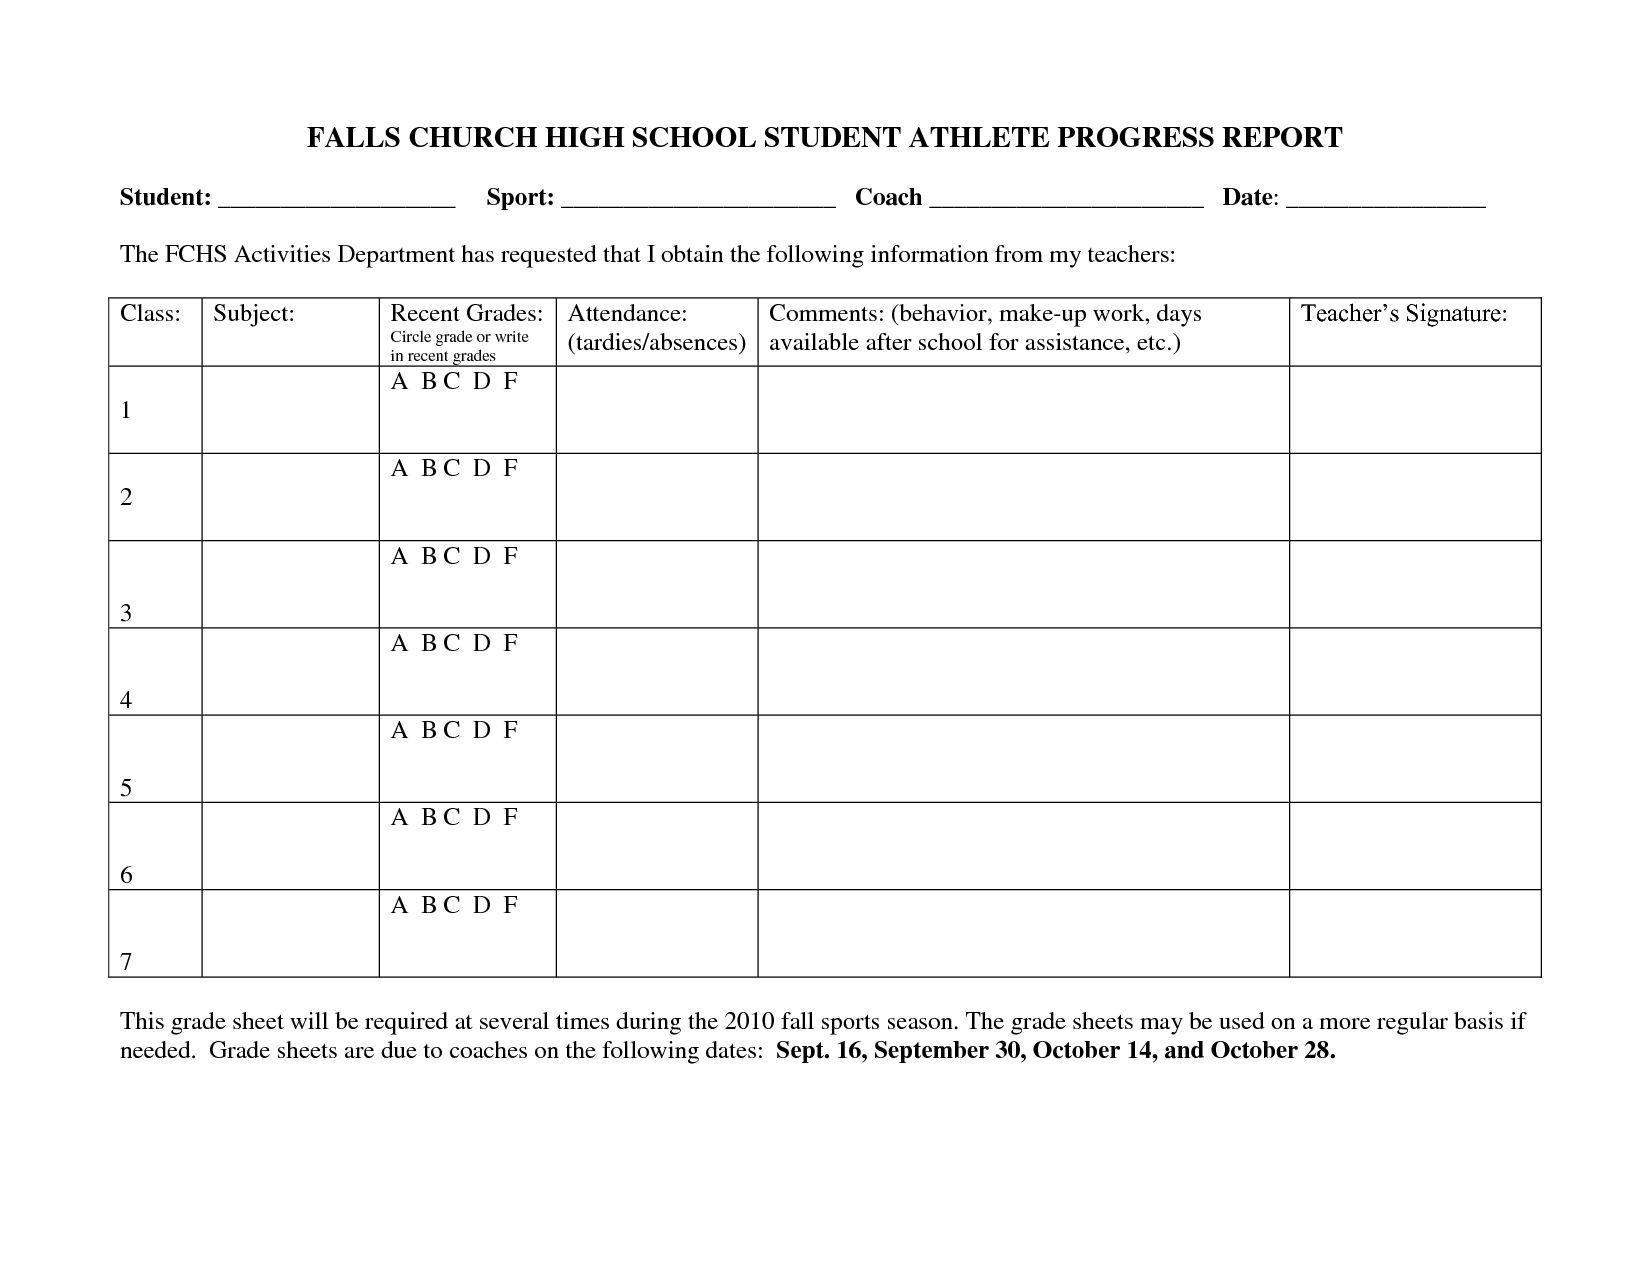 Falls Church High School Student Athlete Progress Report Intended